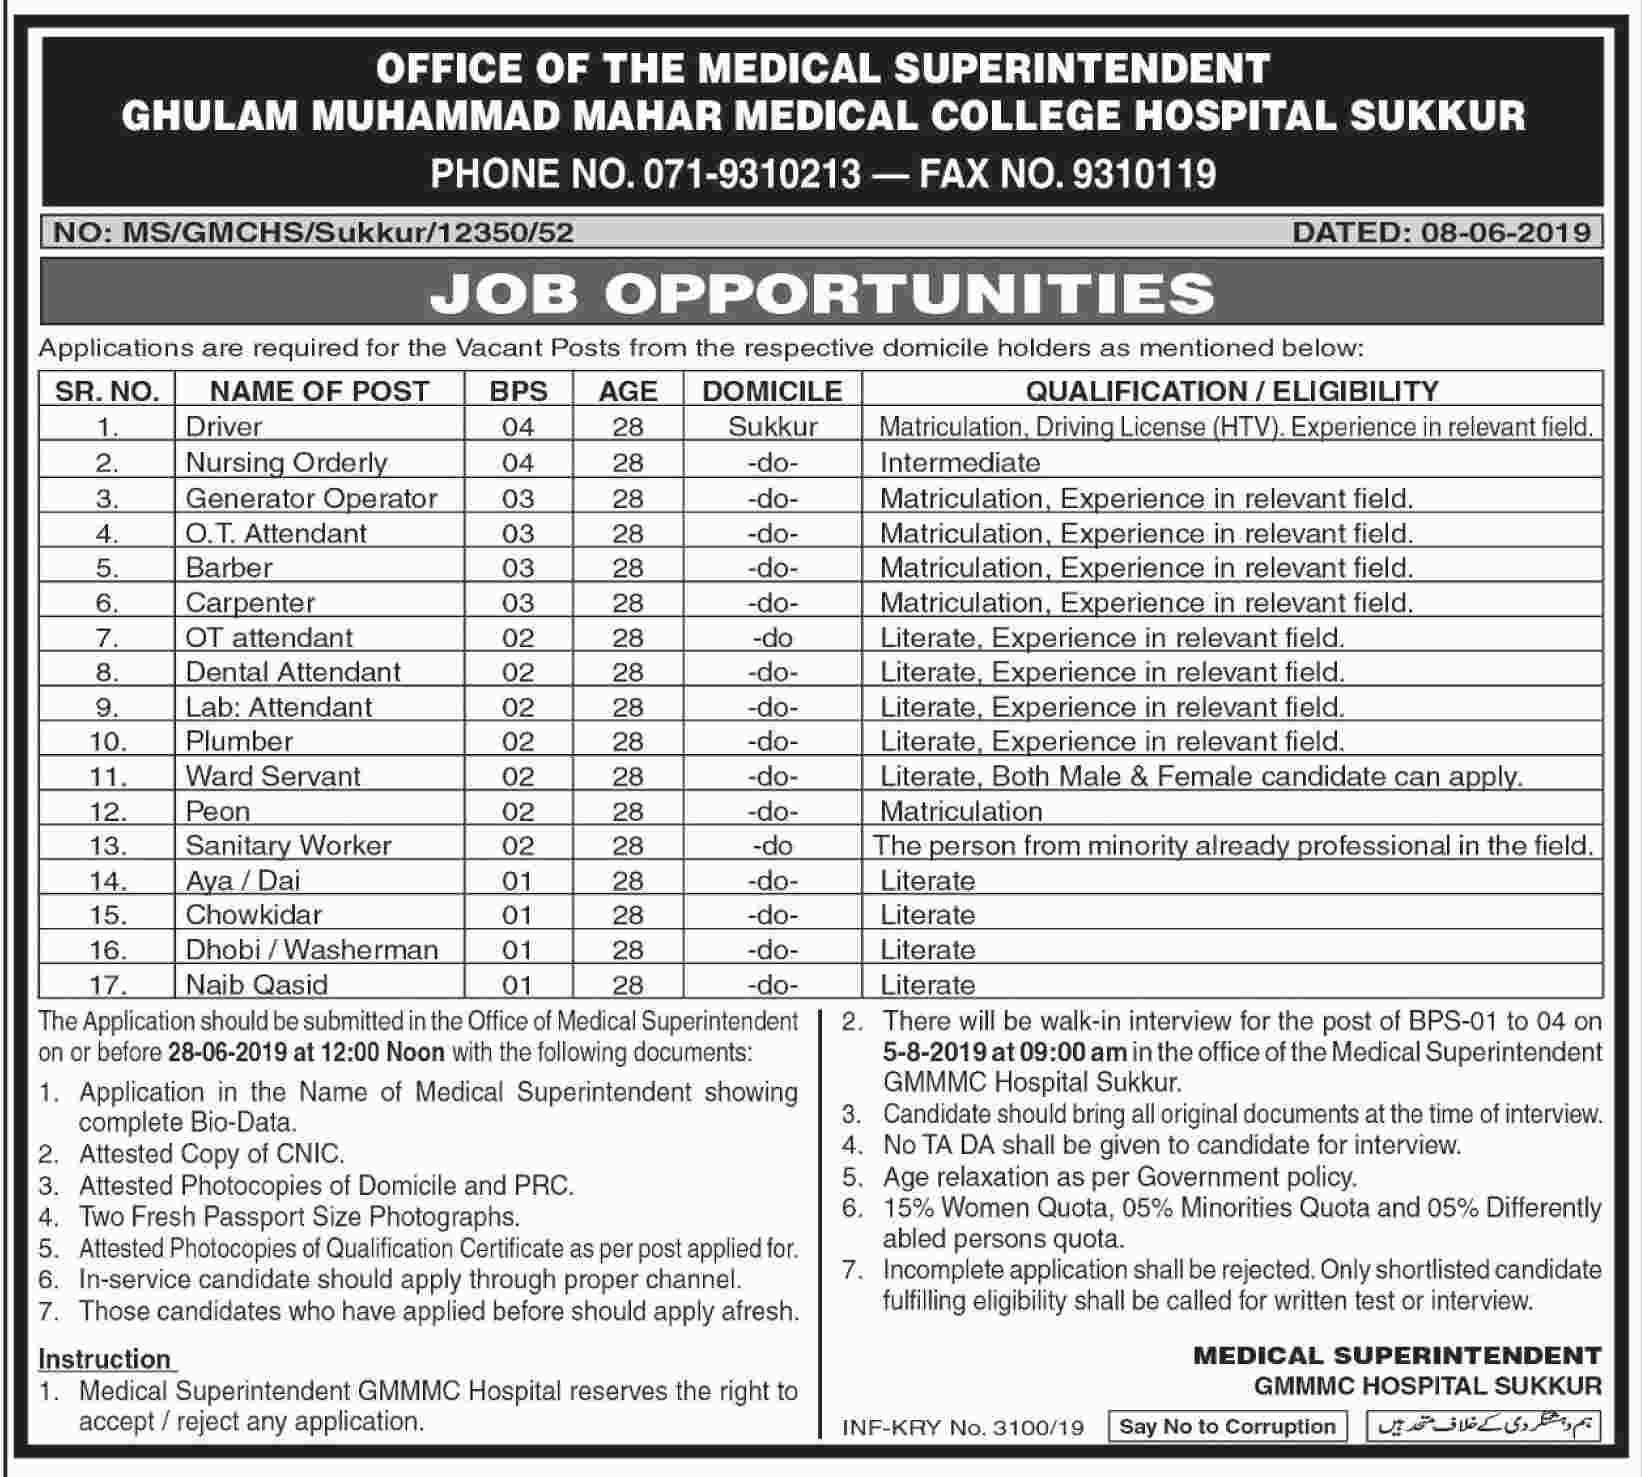 Jobs in Ghulam Mohammad Mahar Medical College Hospital, Sukkur June 2019